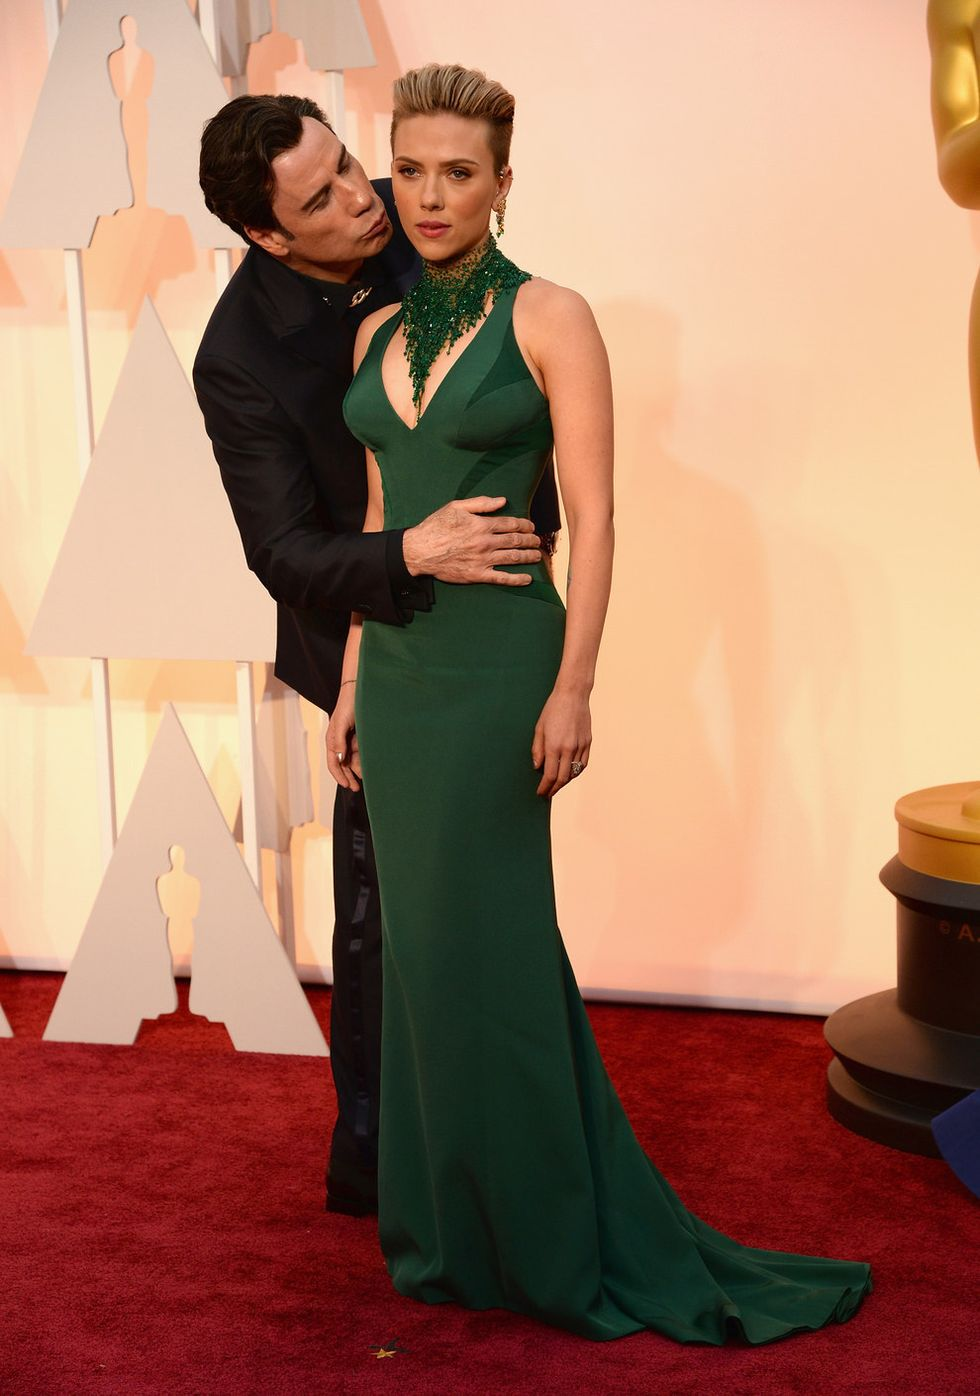 It Was Very Normal When John Travolta Kissed Scarlett Johansson, Says Scarlett Johansson